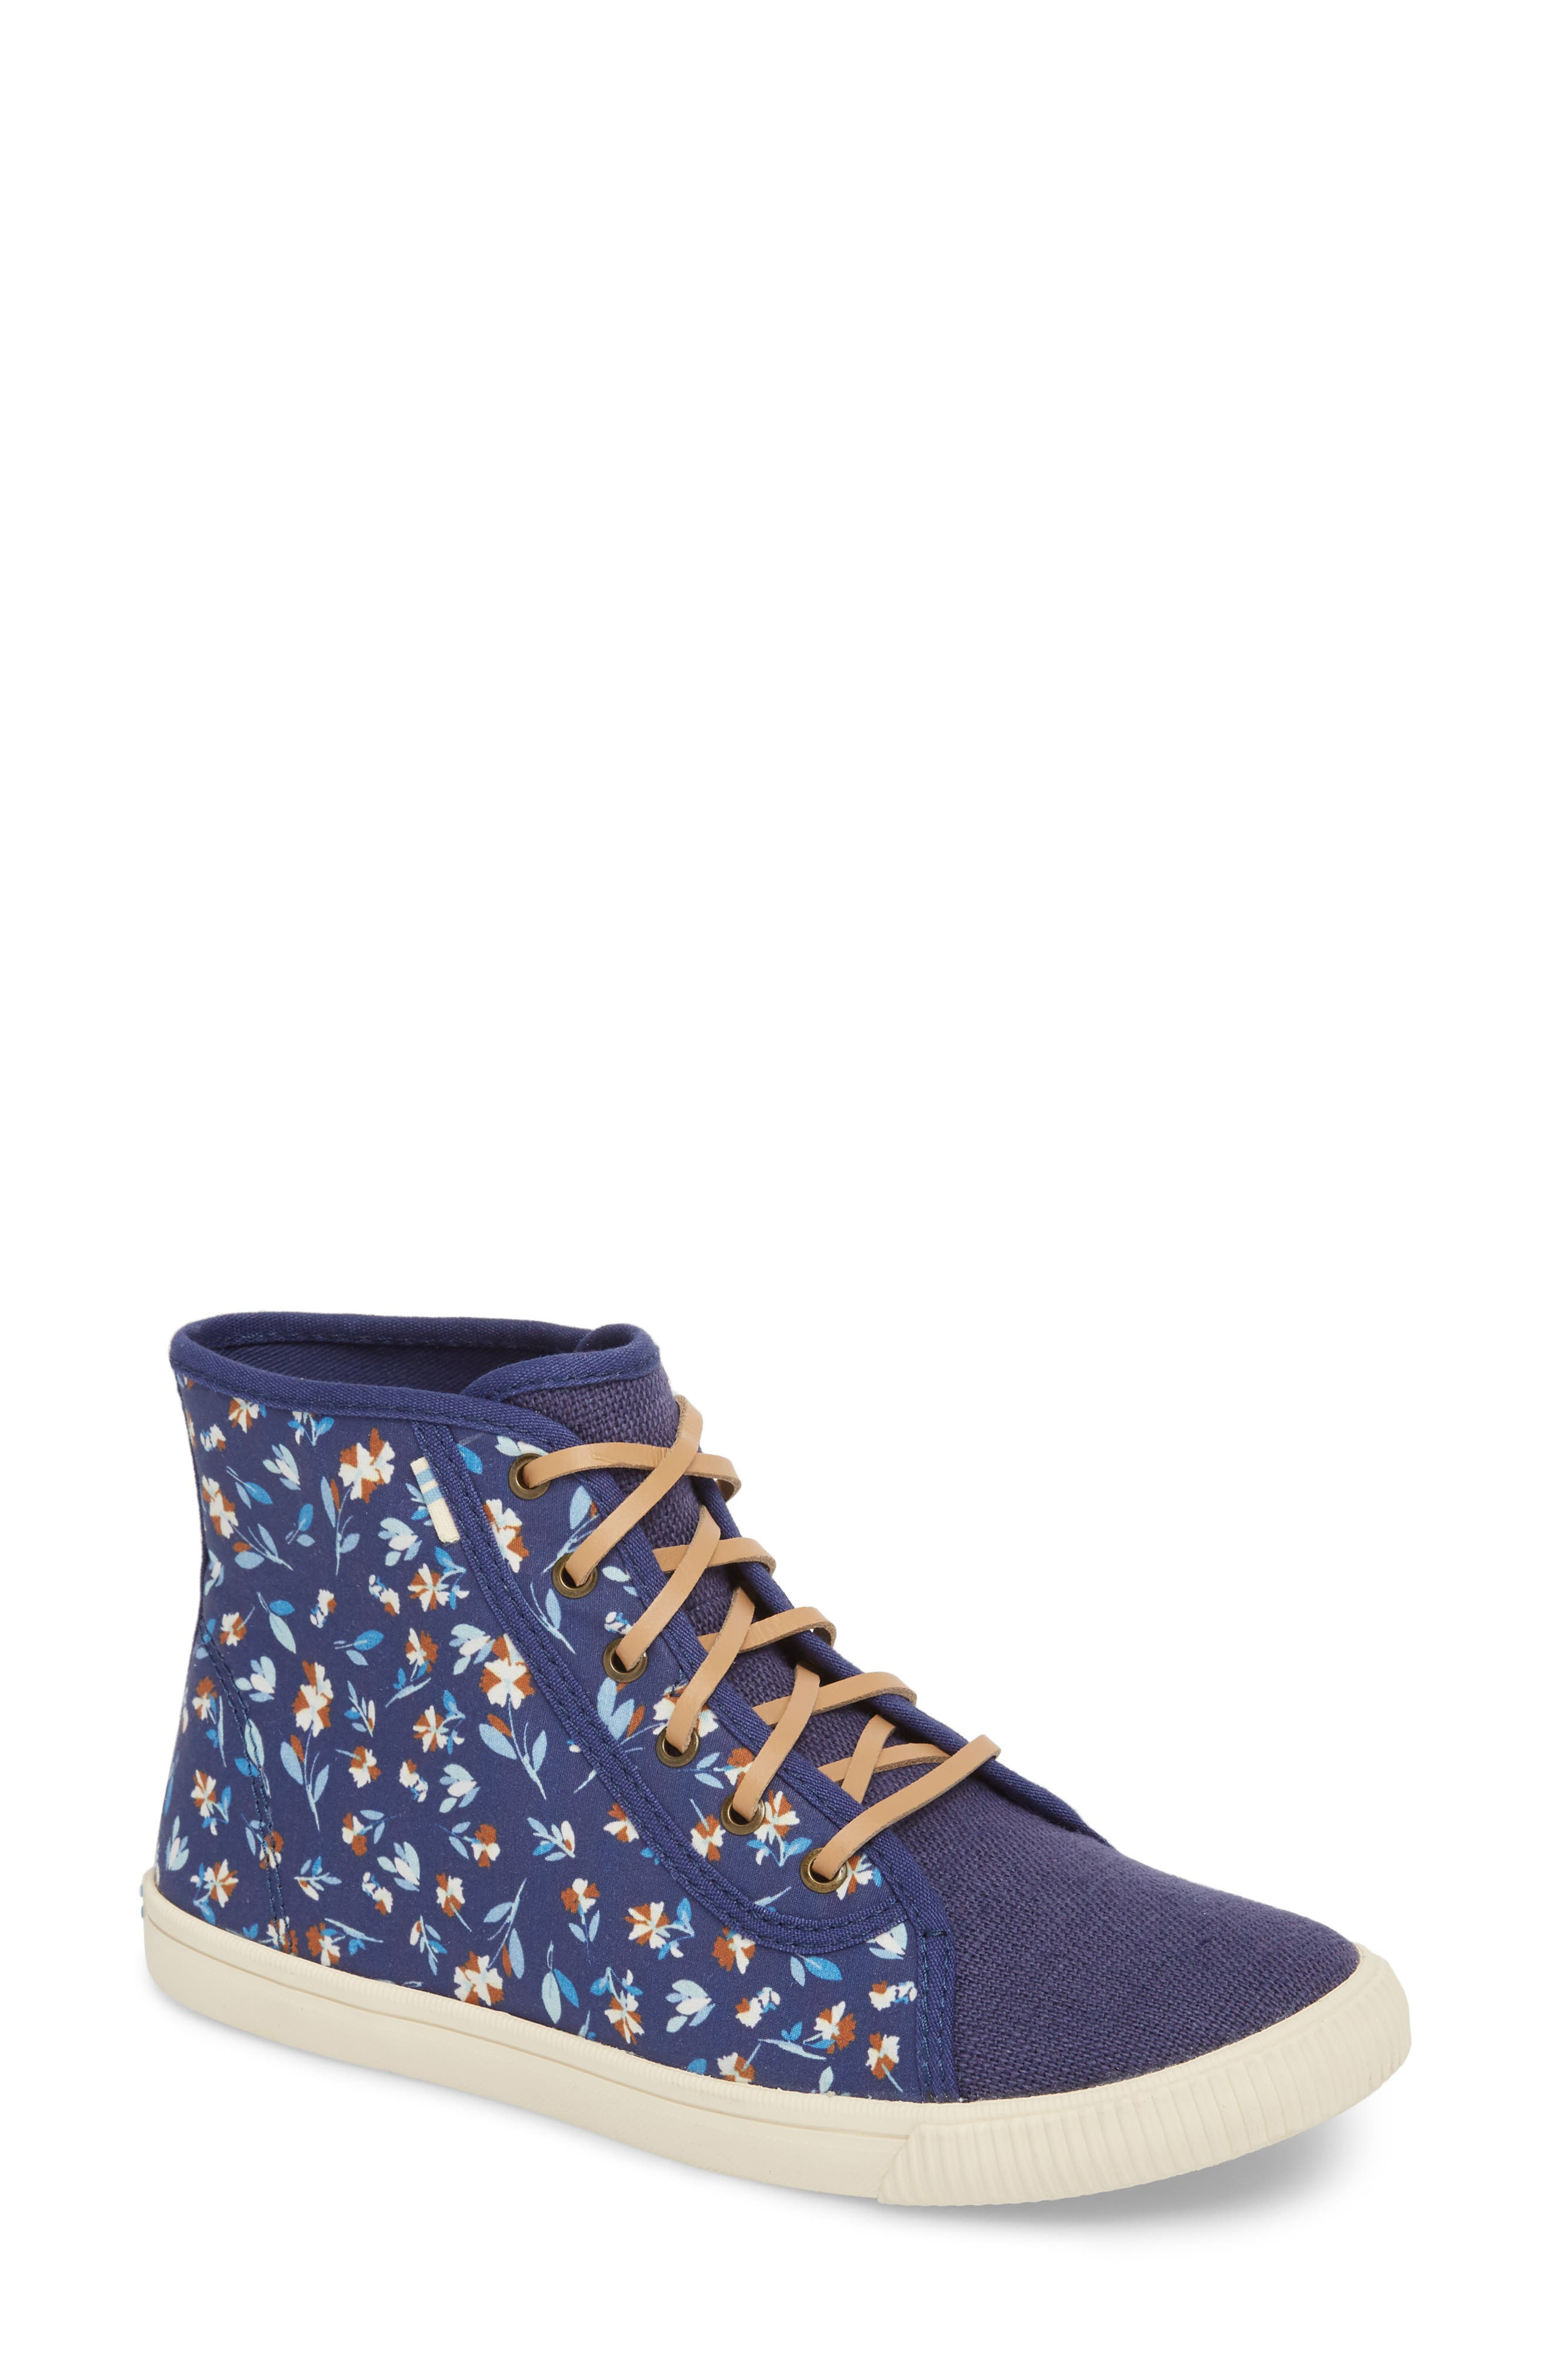 Camarillo High Top Sneaker,                         Main,                         color, Deep Blue Vintage Flower